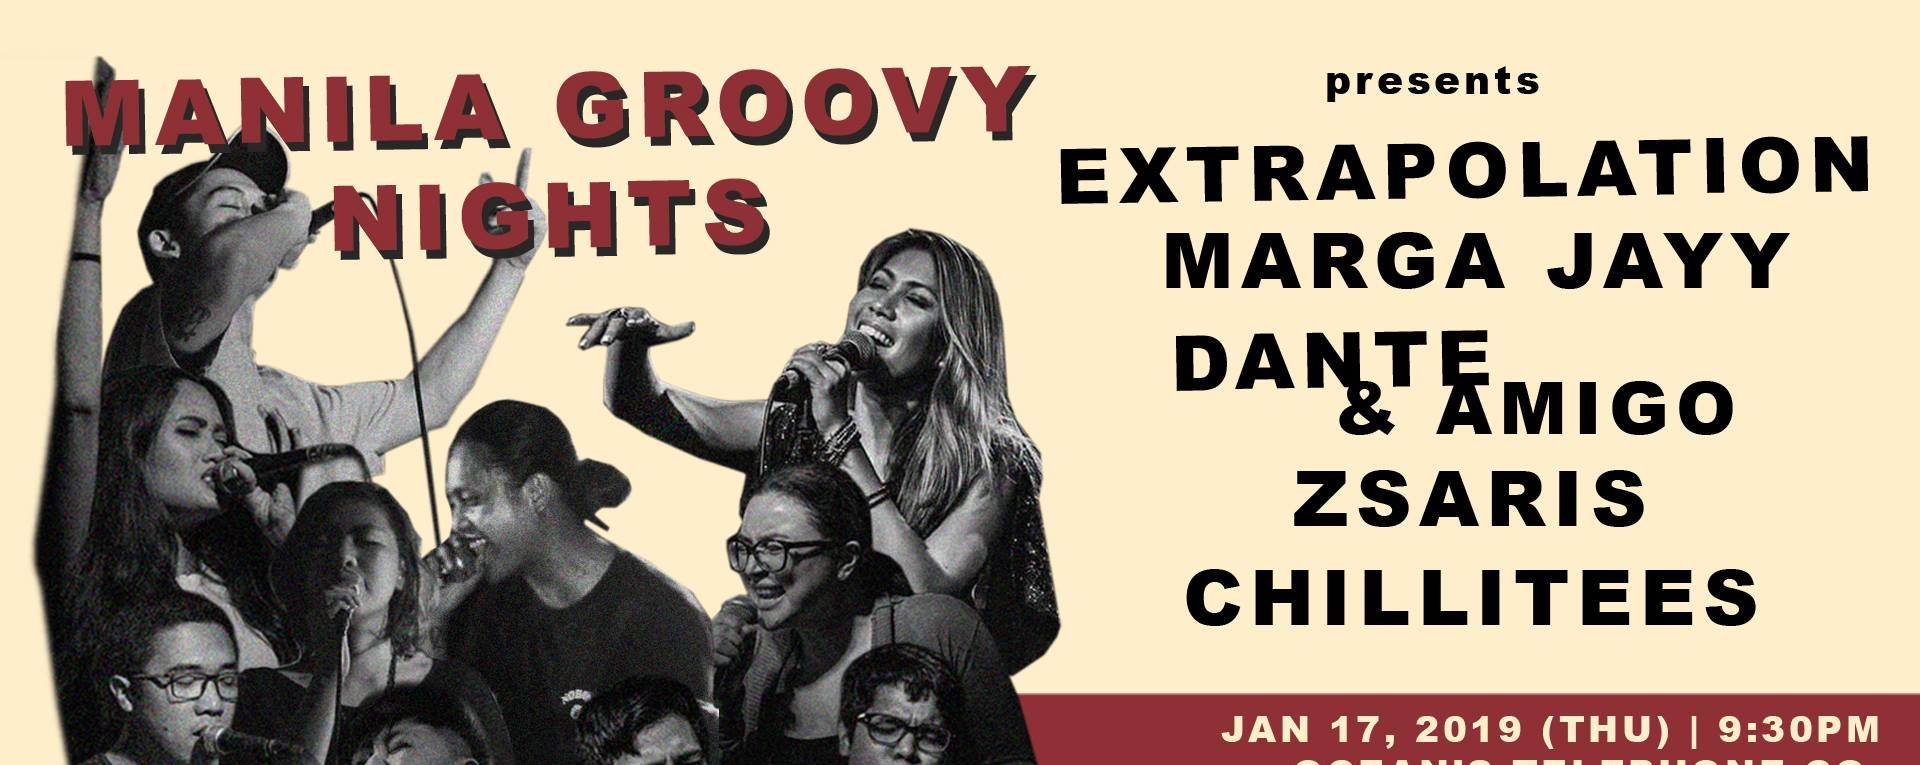 Manila Groovy Nights